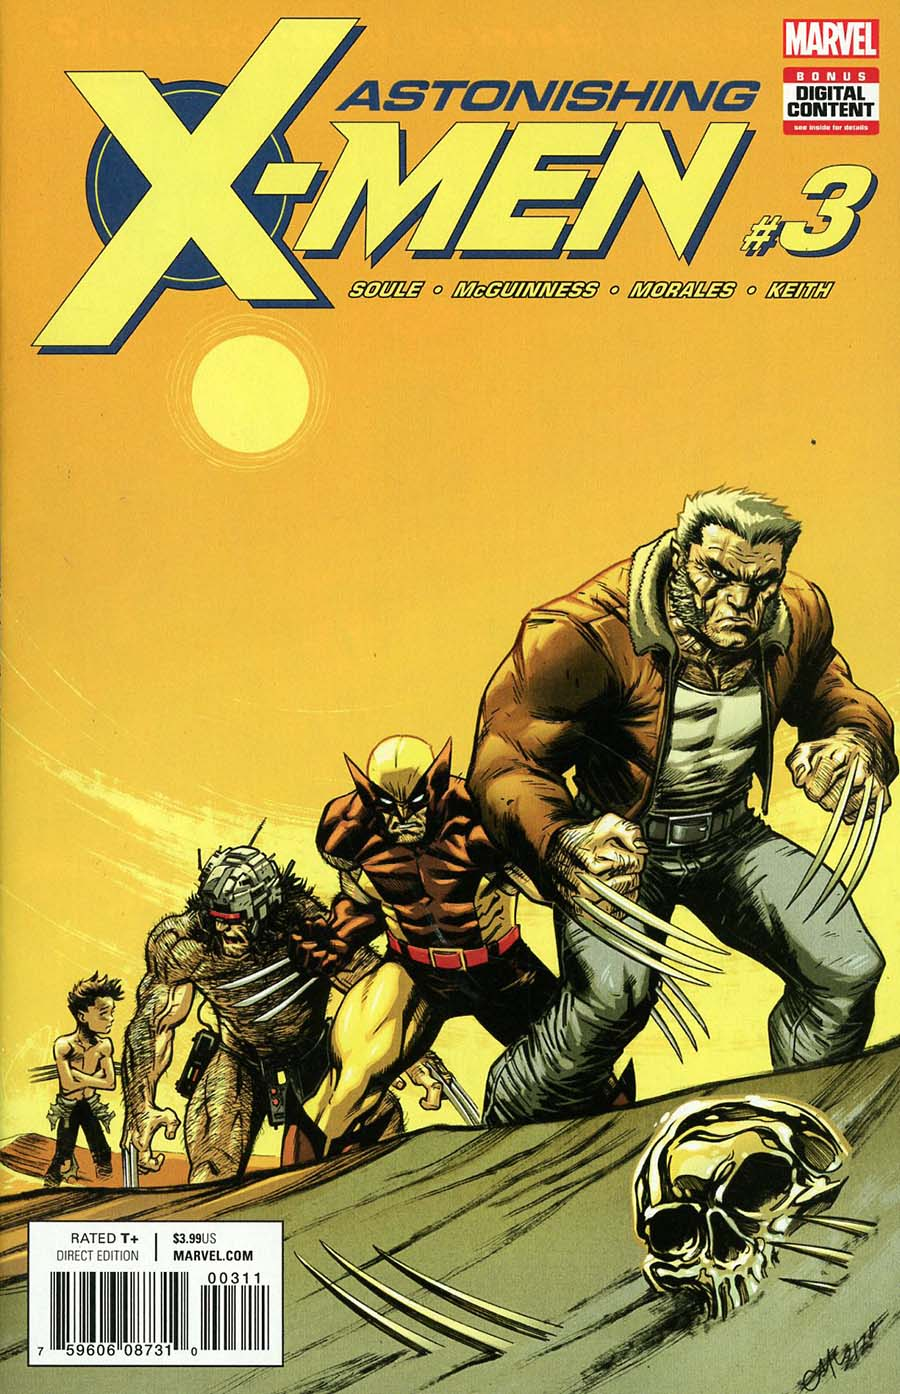 Astonishing X-Men Vol 4 #3 Cover A Regular Ed McGuinness Cover